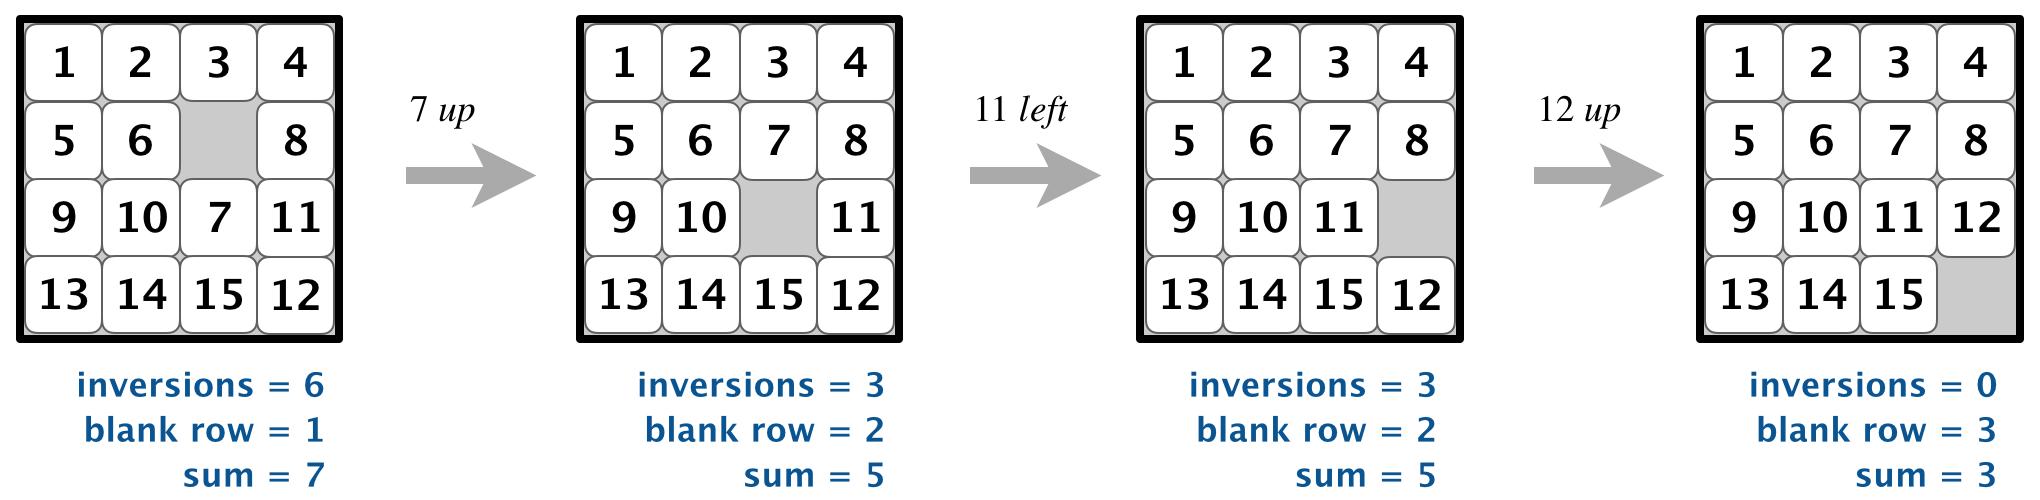 15 Puzzle Javascript Source Code